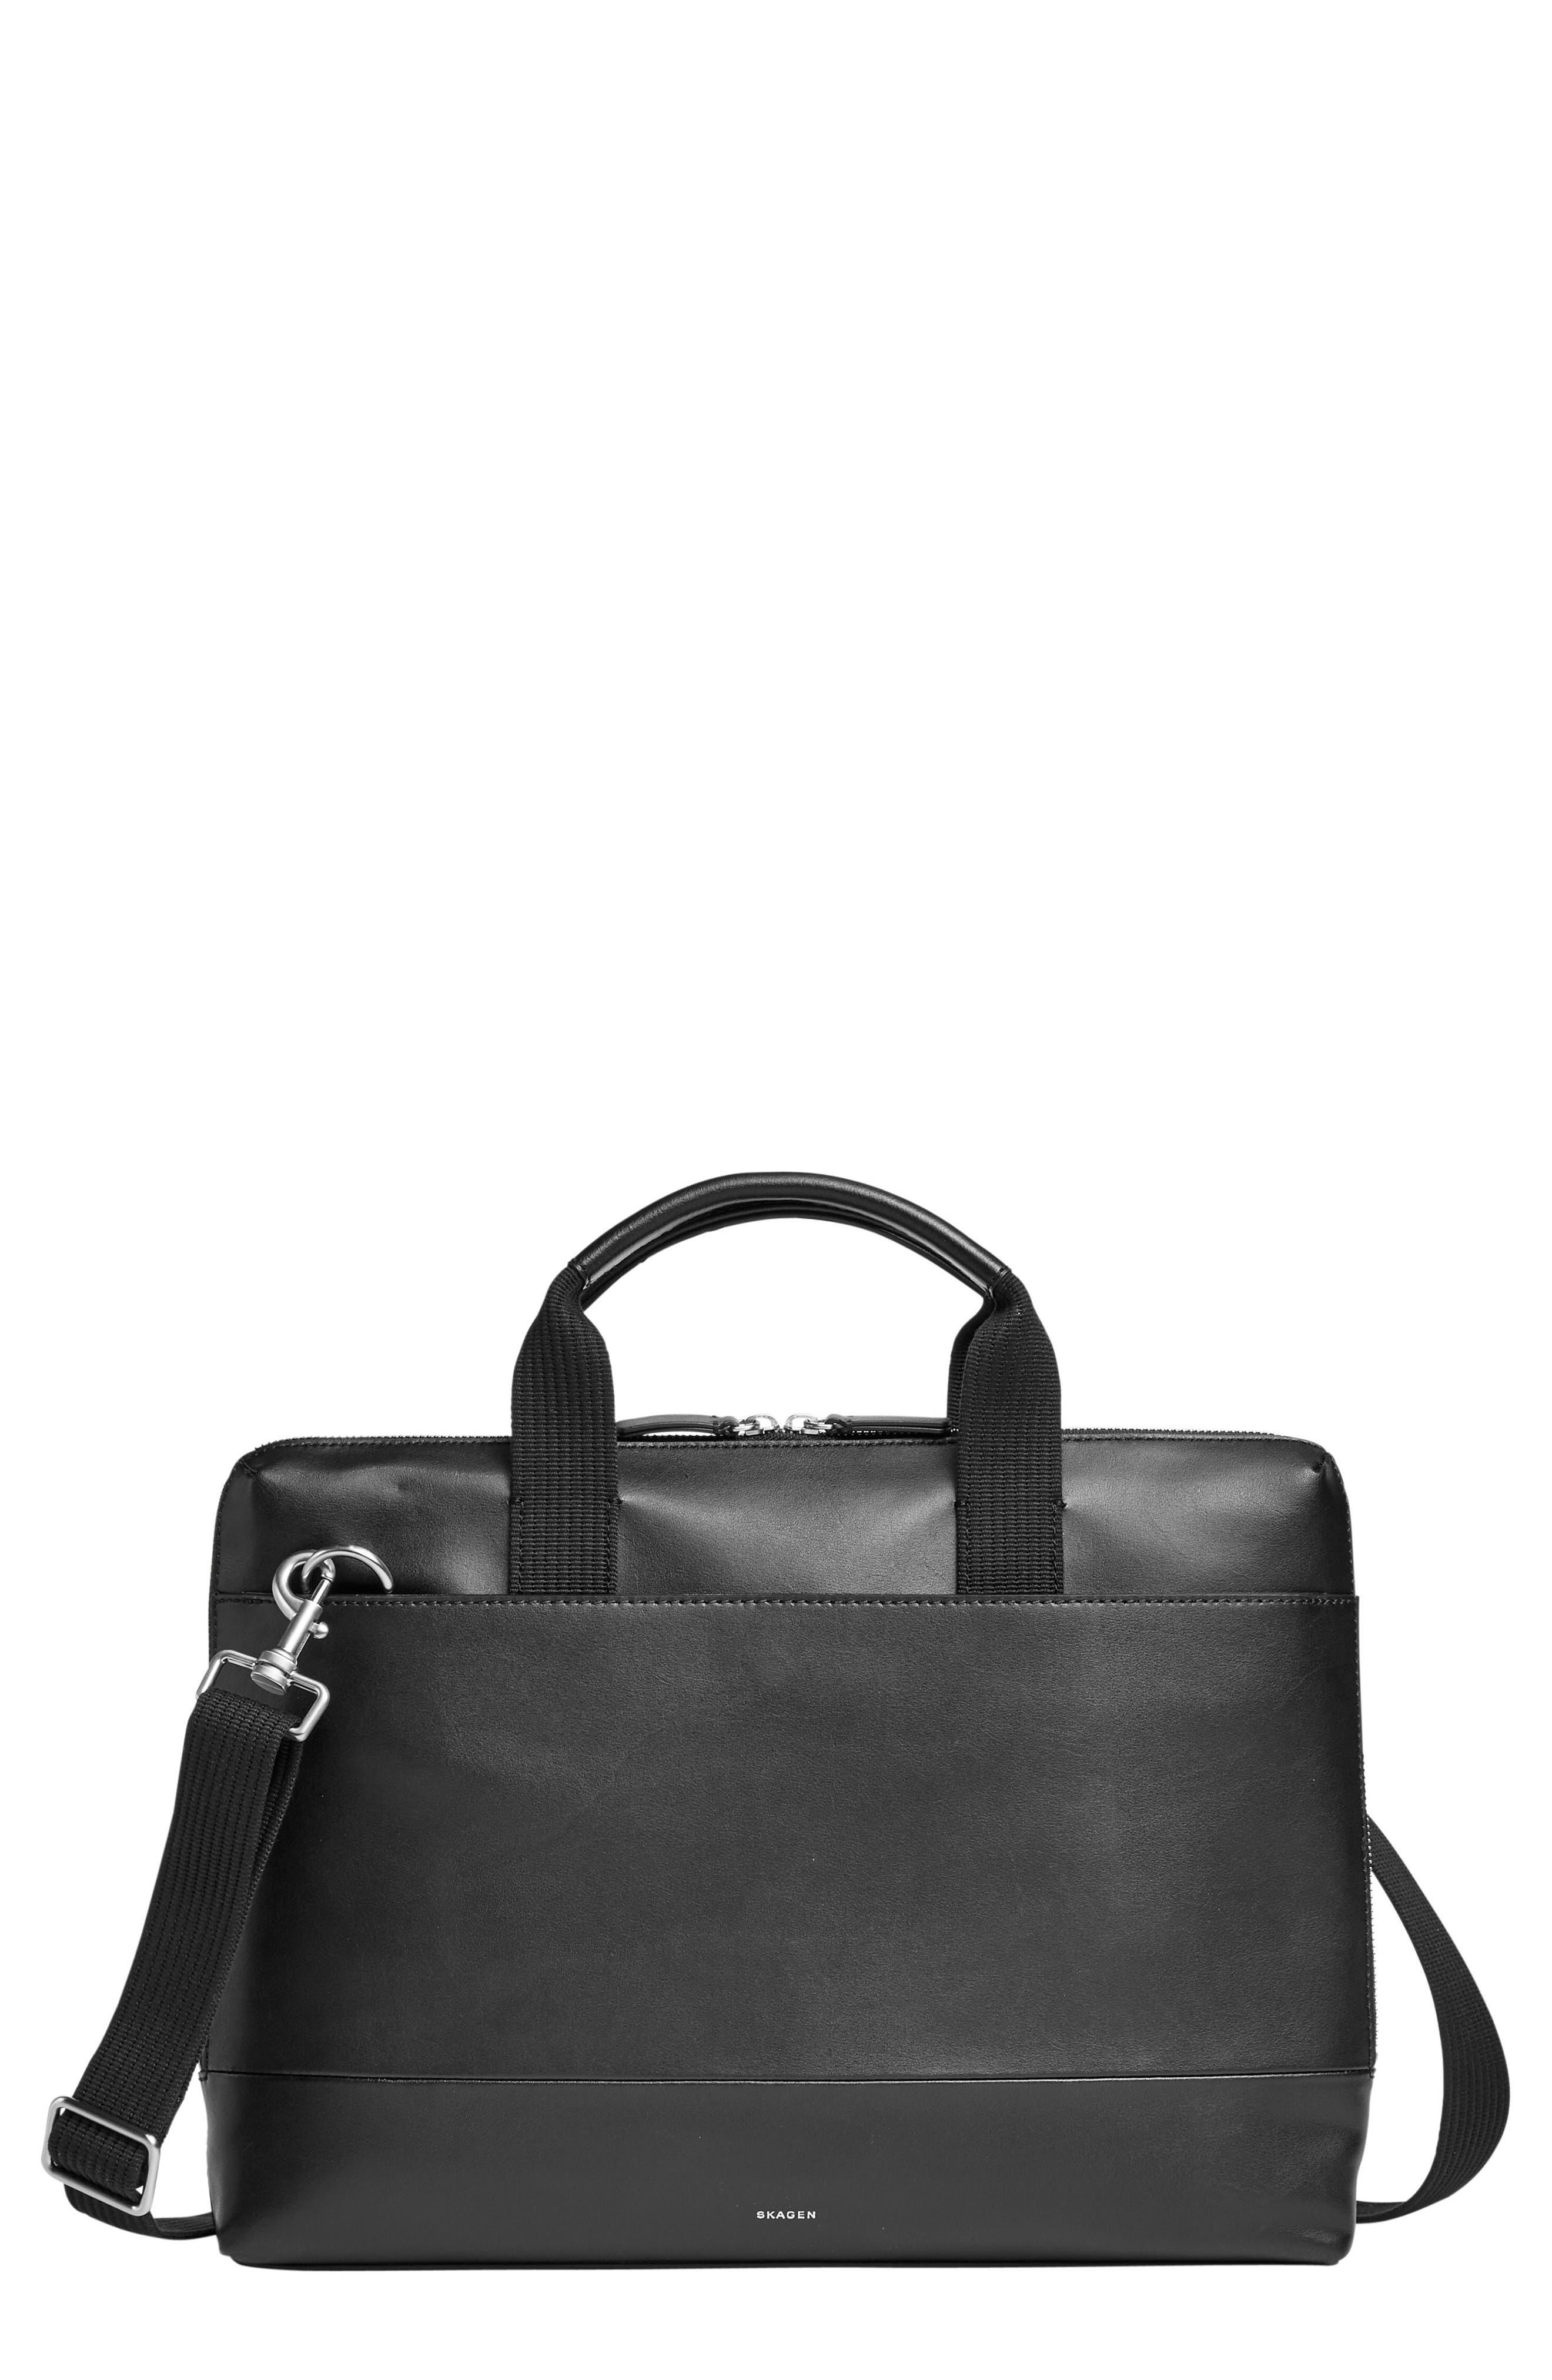 Peder Leather Briefcase,                             Main thumbnail 1, color,                             001